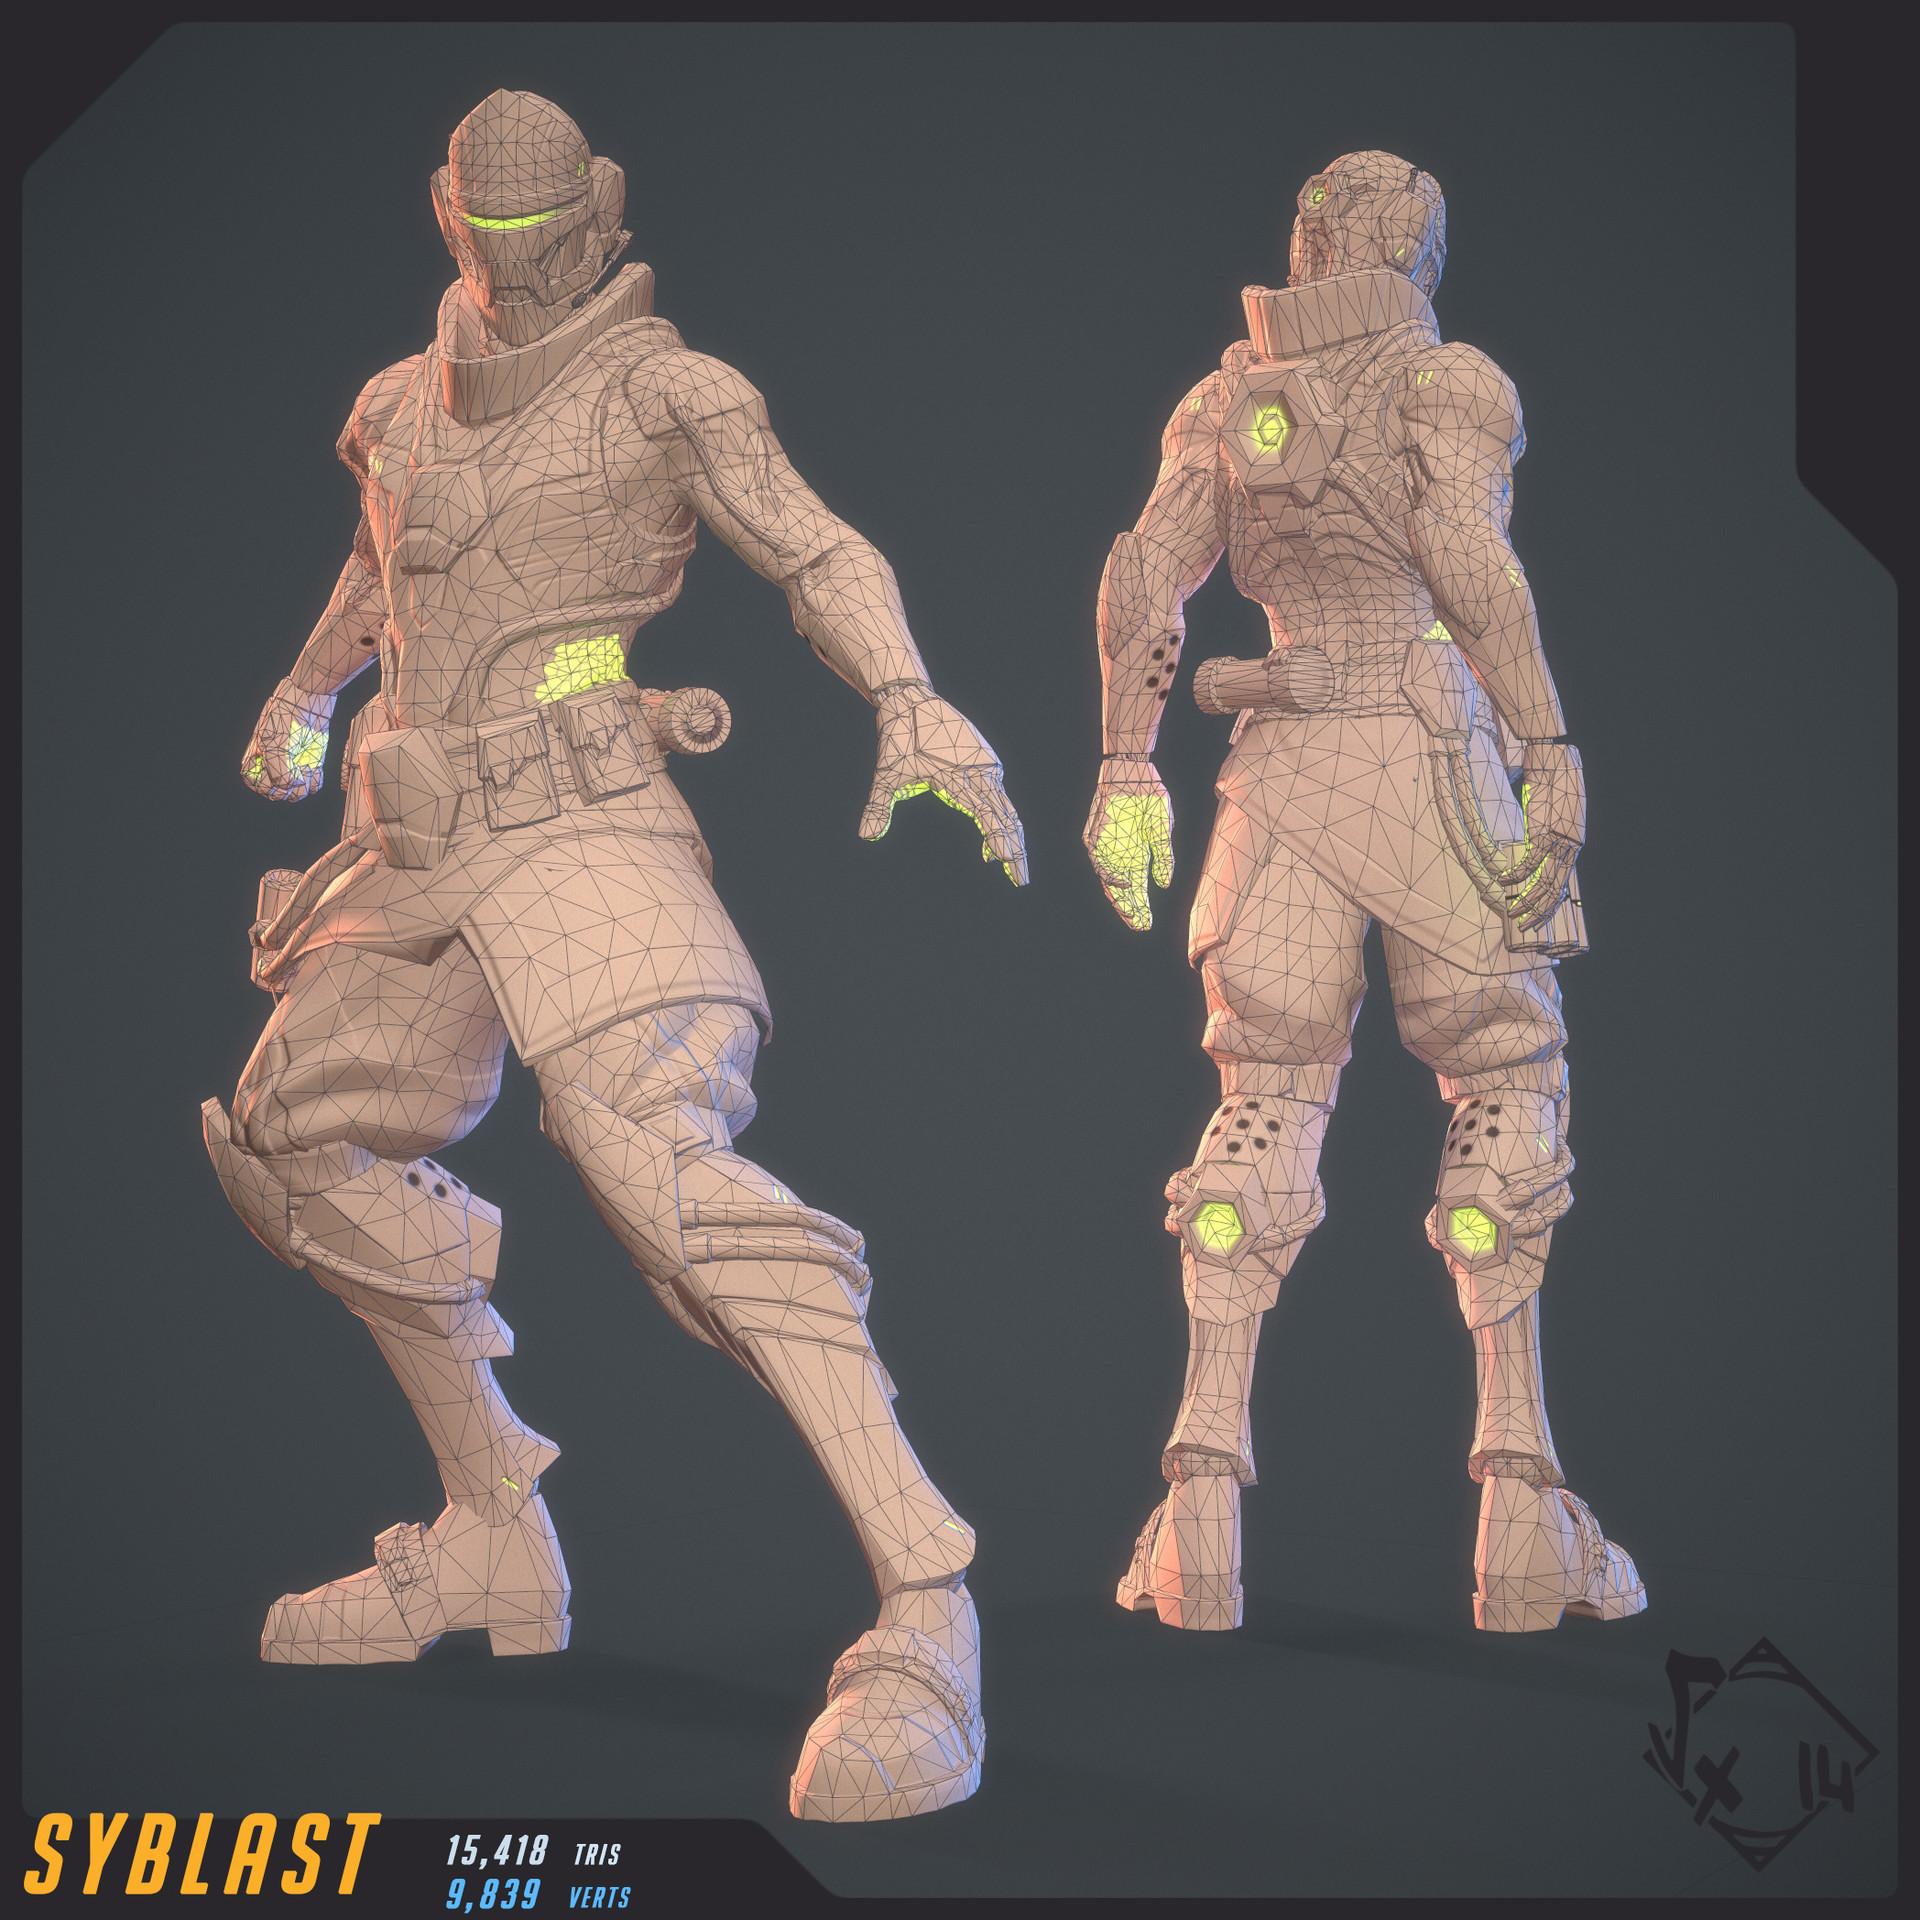 etienne-beschet-cha-syblast-wireframe-cyborg.jpg?1544636814